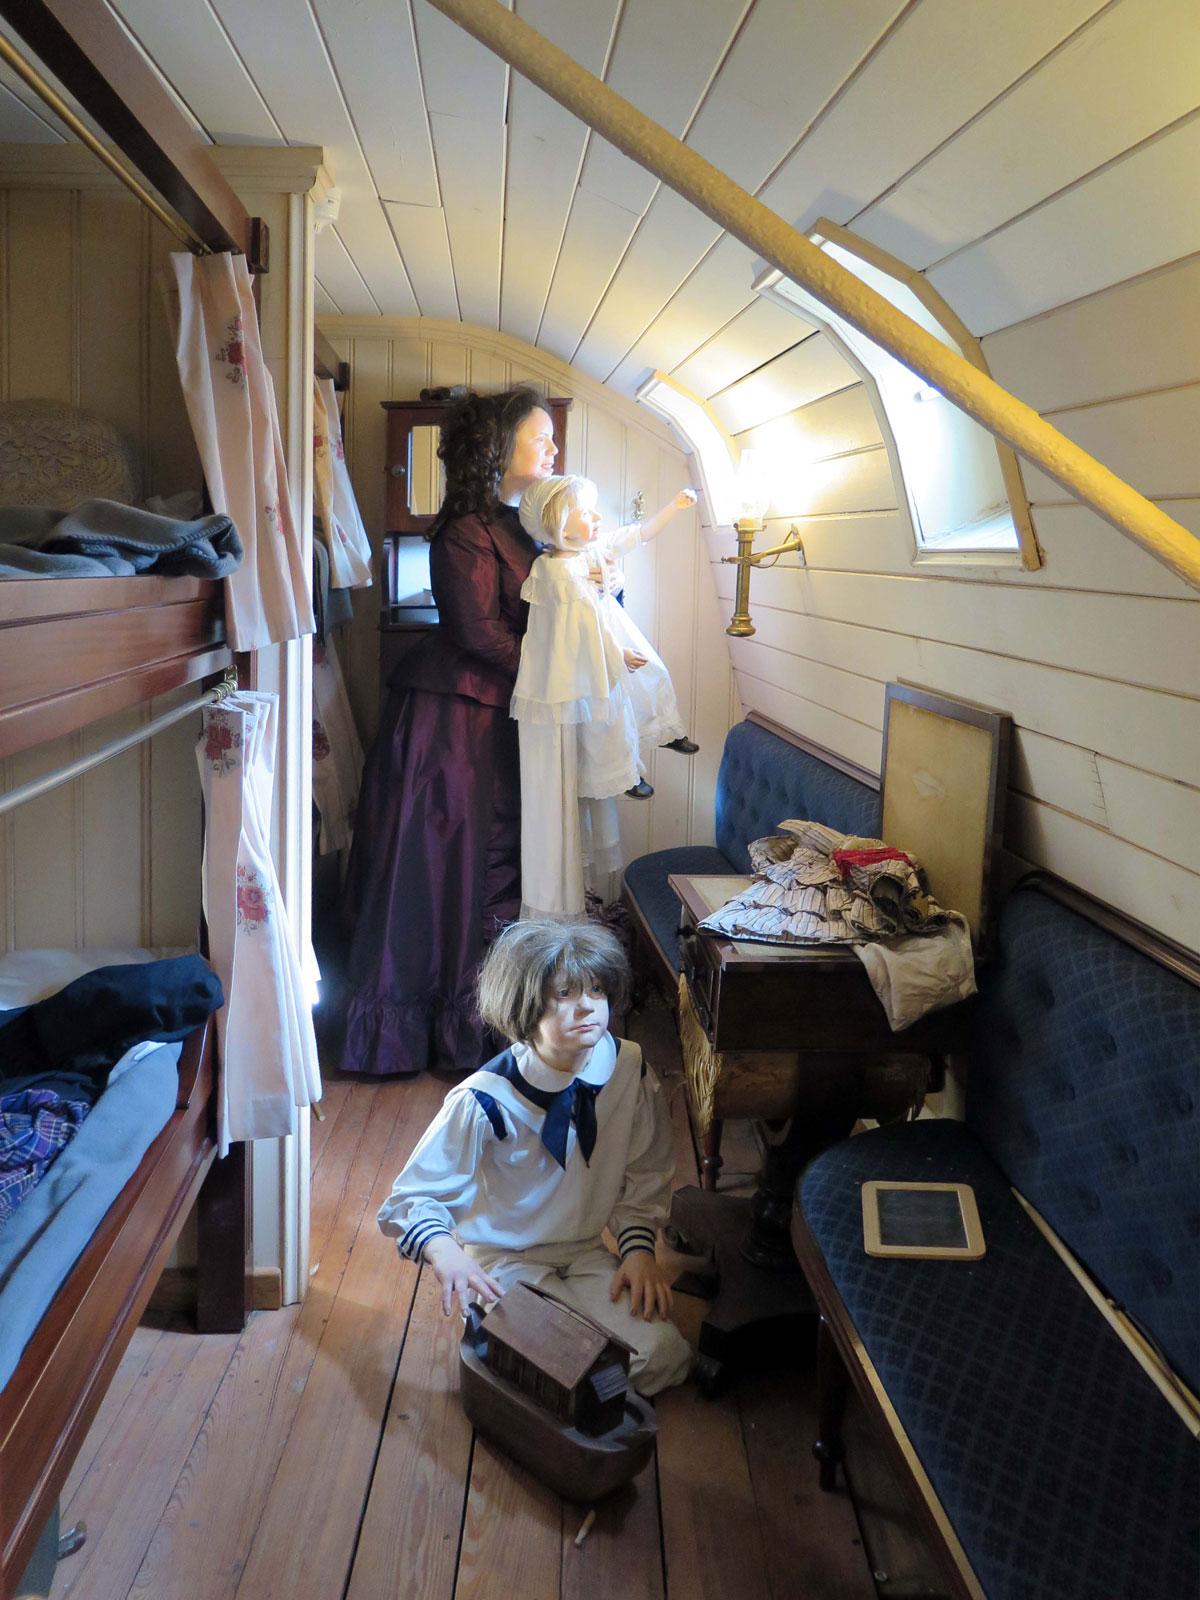 Steerage Class Accommodation